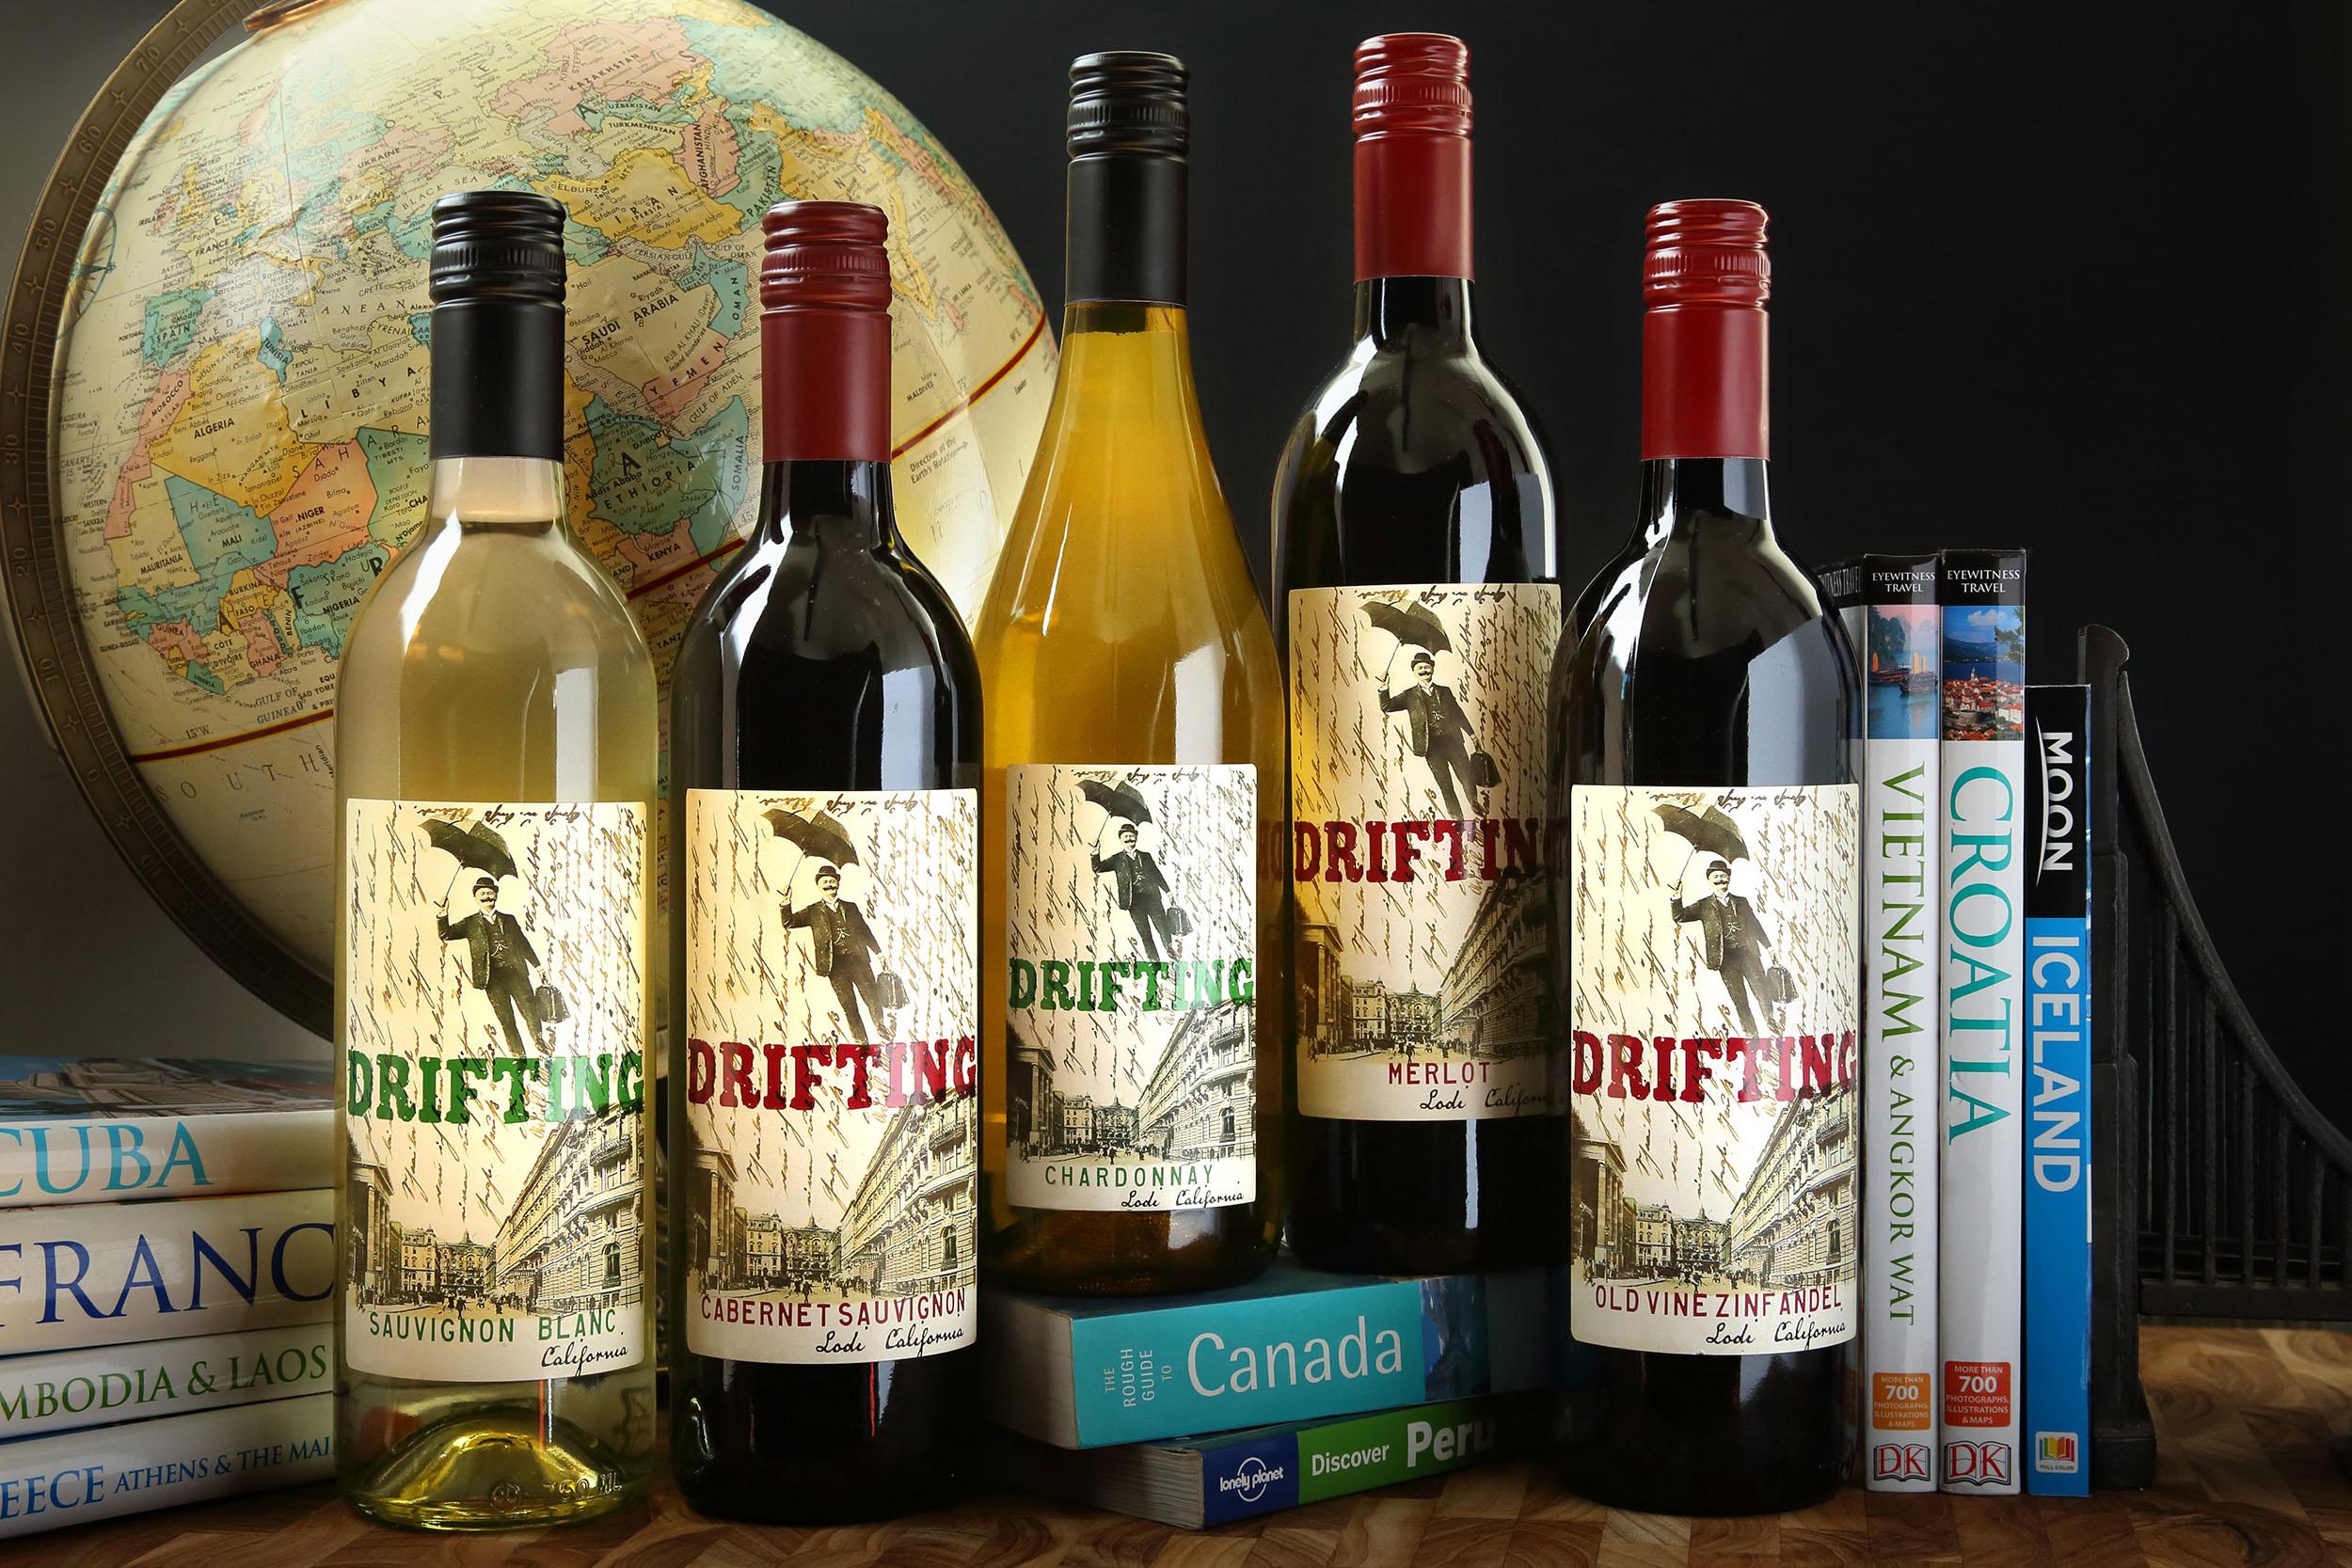 Drifting Wines